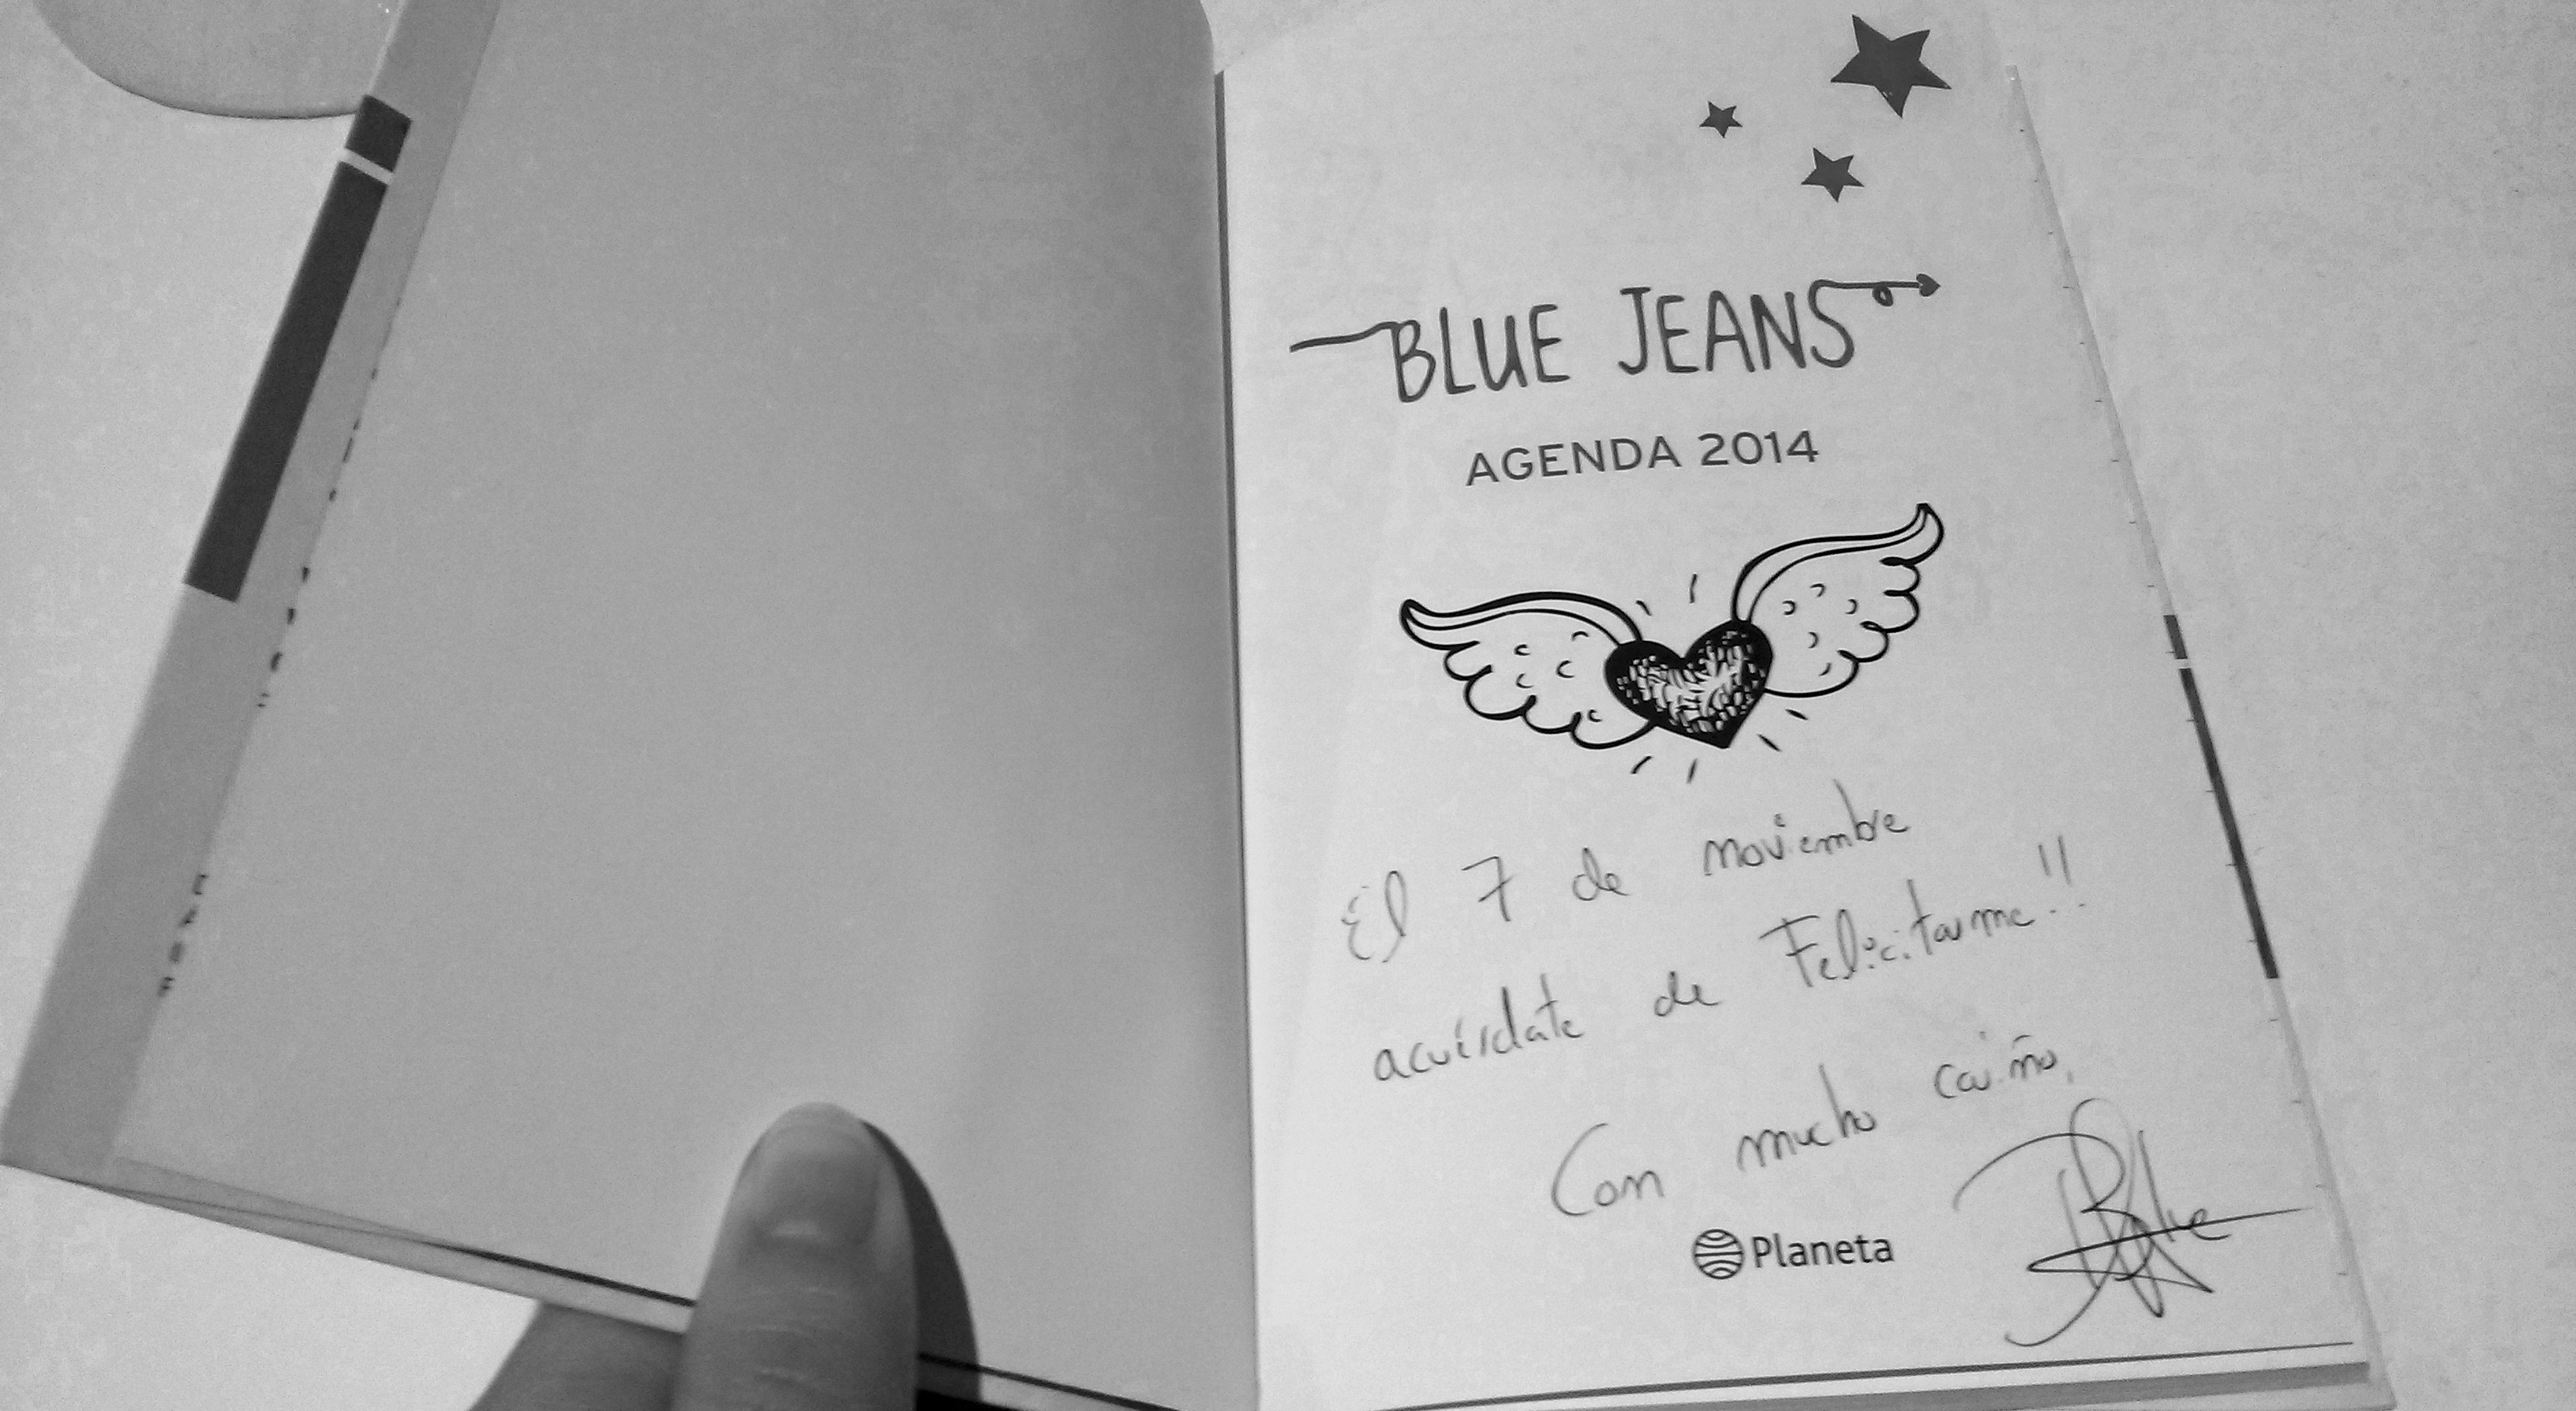 Detalle de la firma-dedicatoria de Blue Jeans